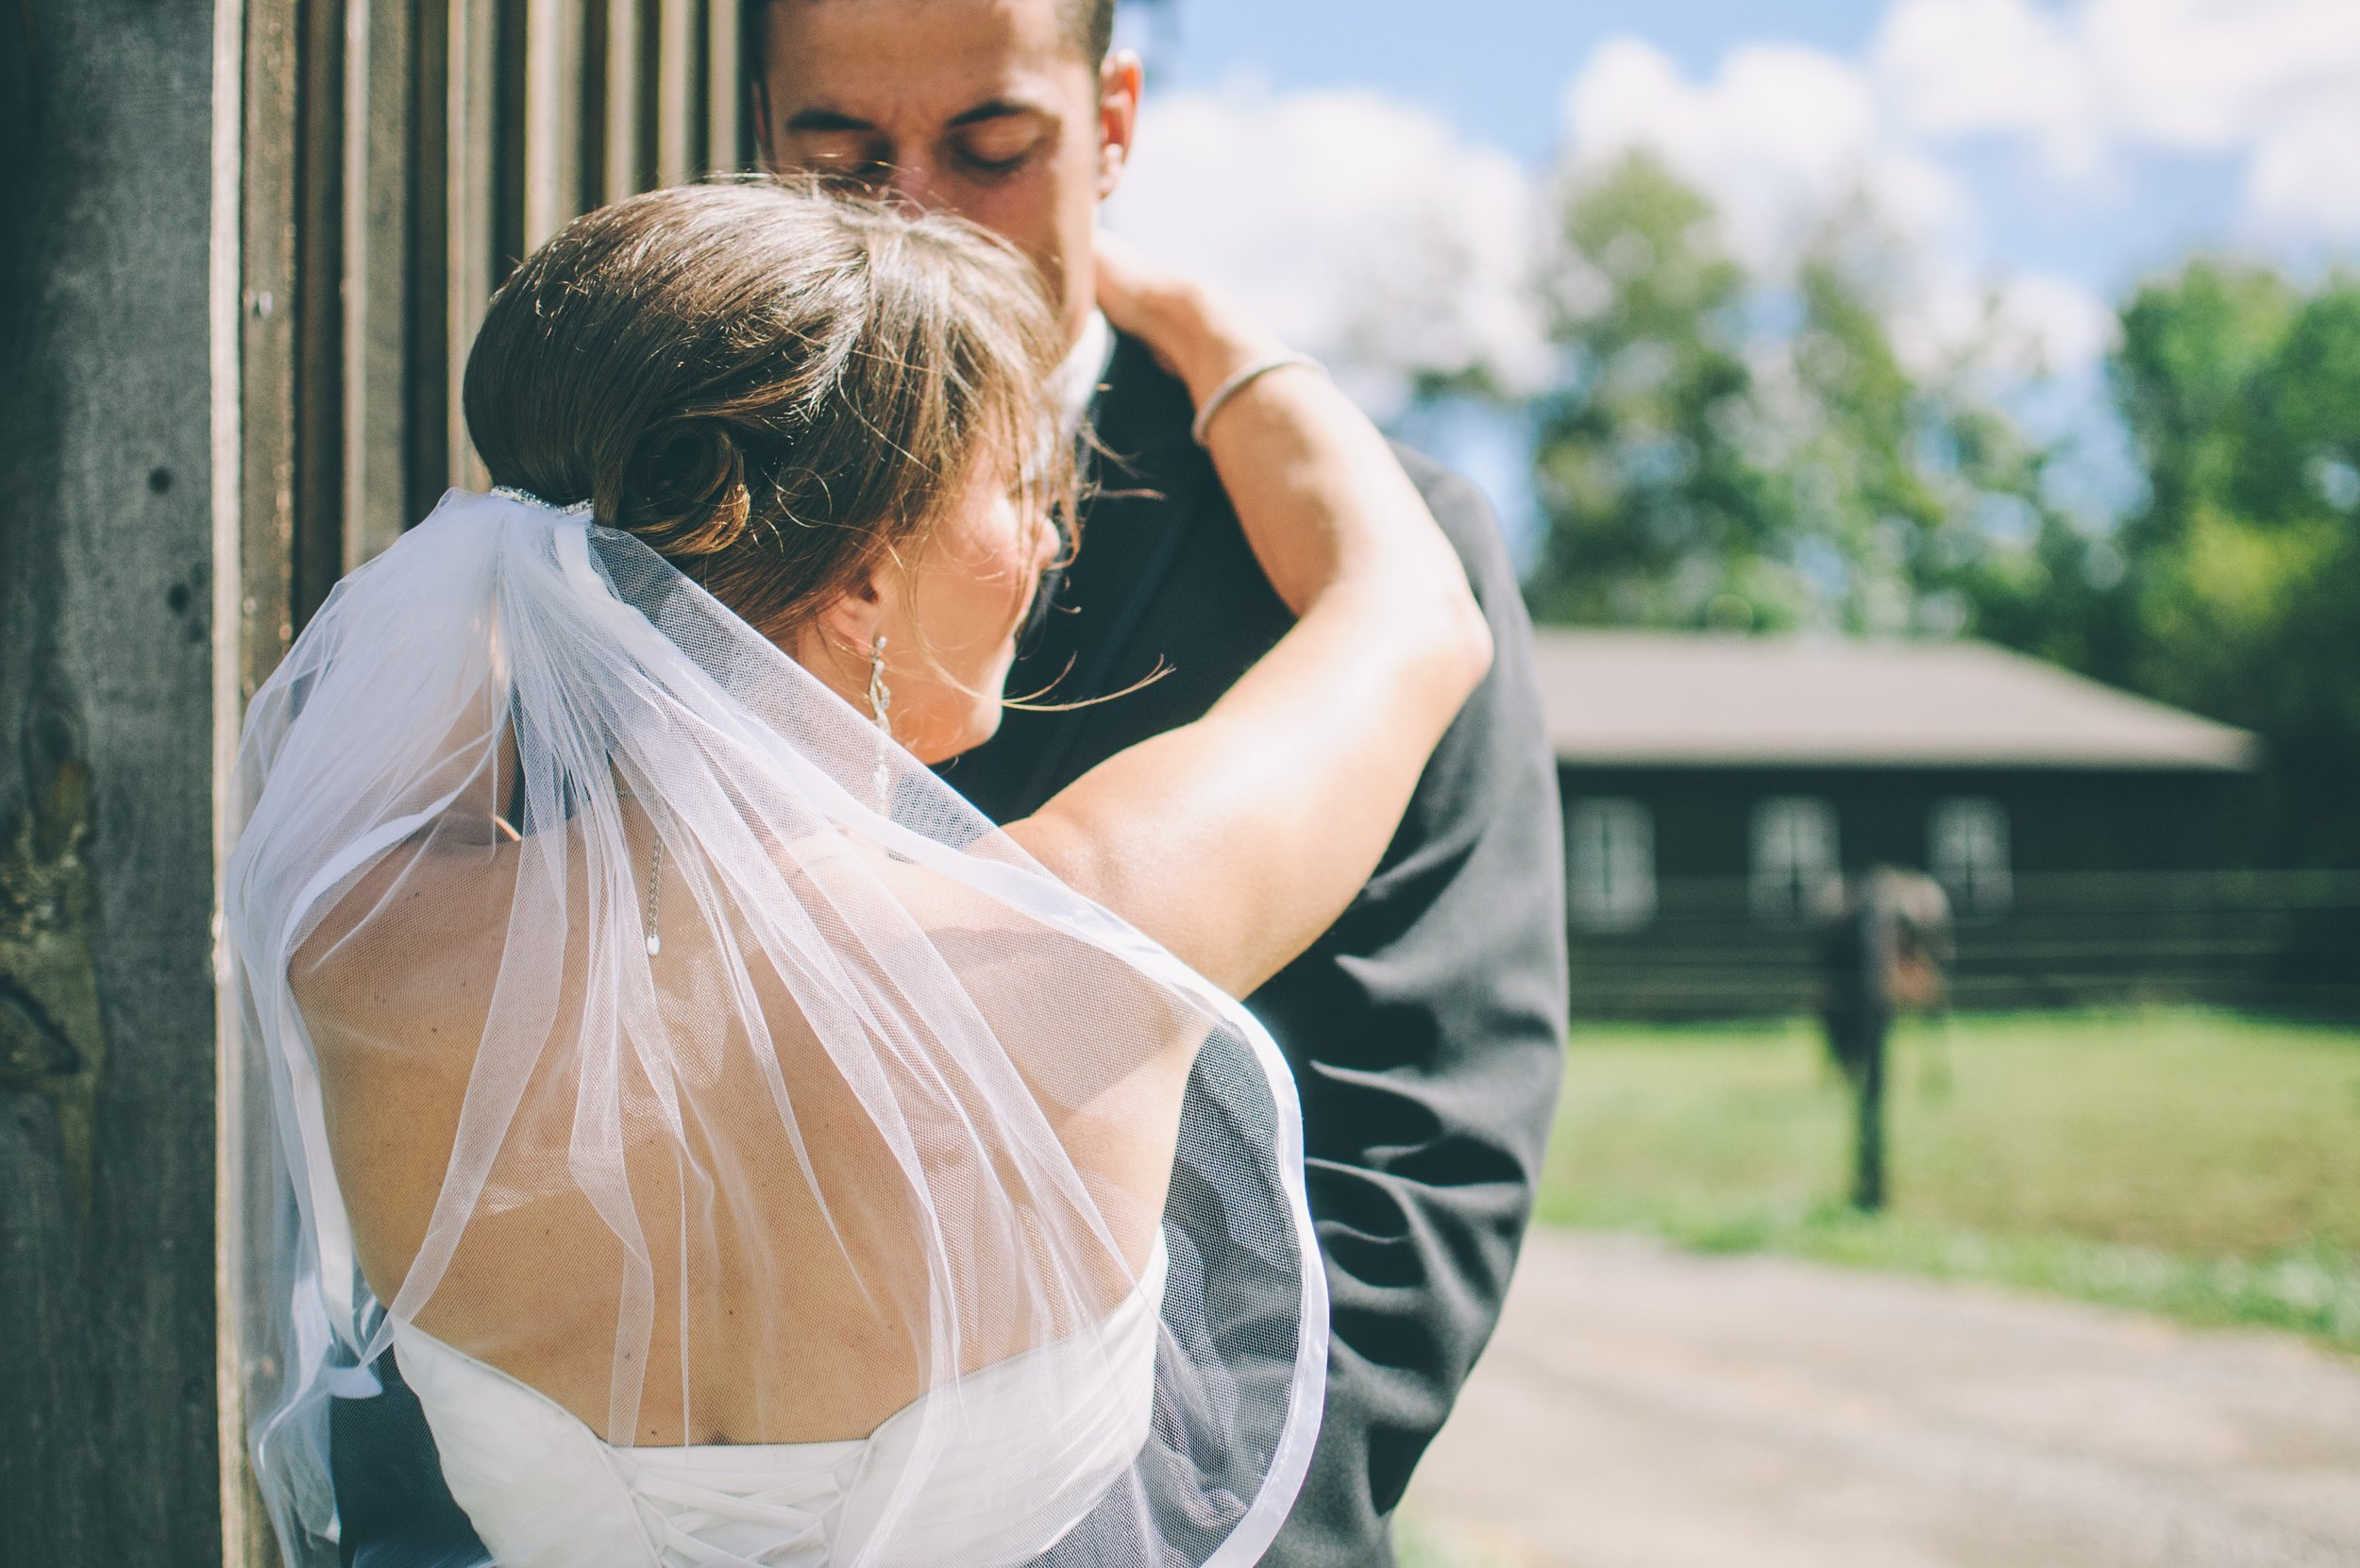 bride-couple-girl-137576.jpg